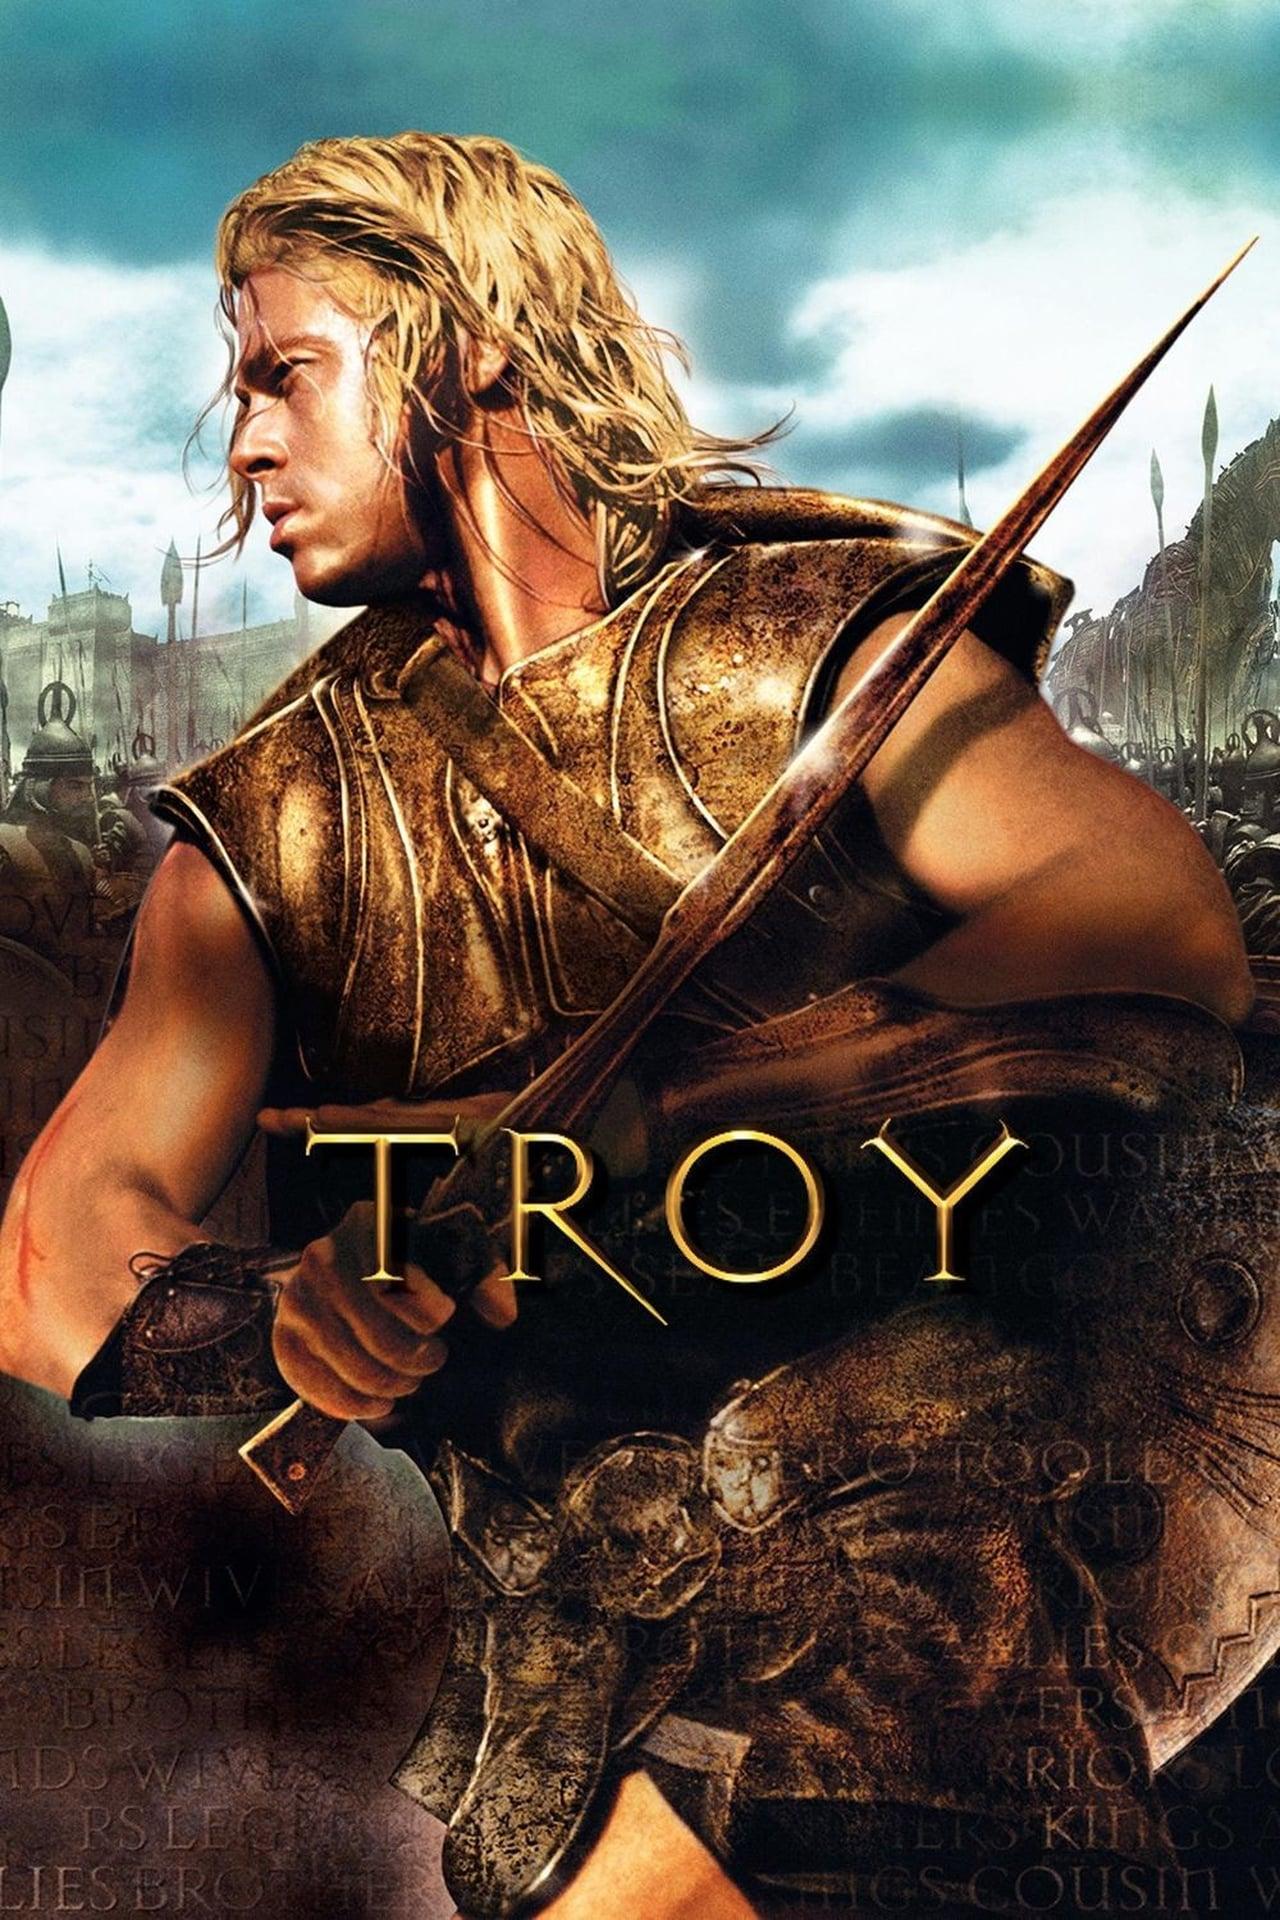 Troy by Wolfgang Petersen